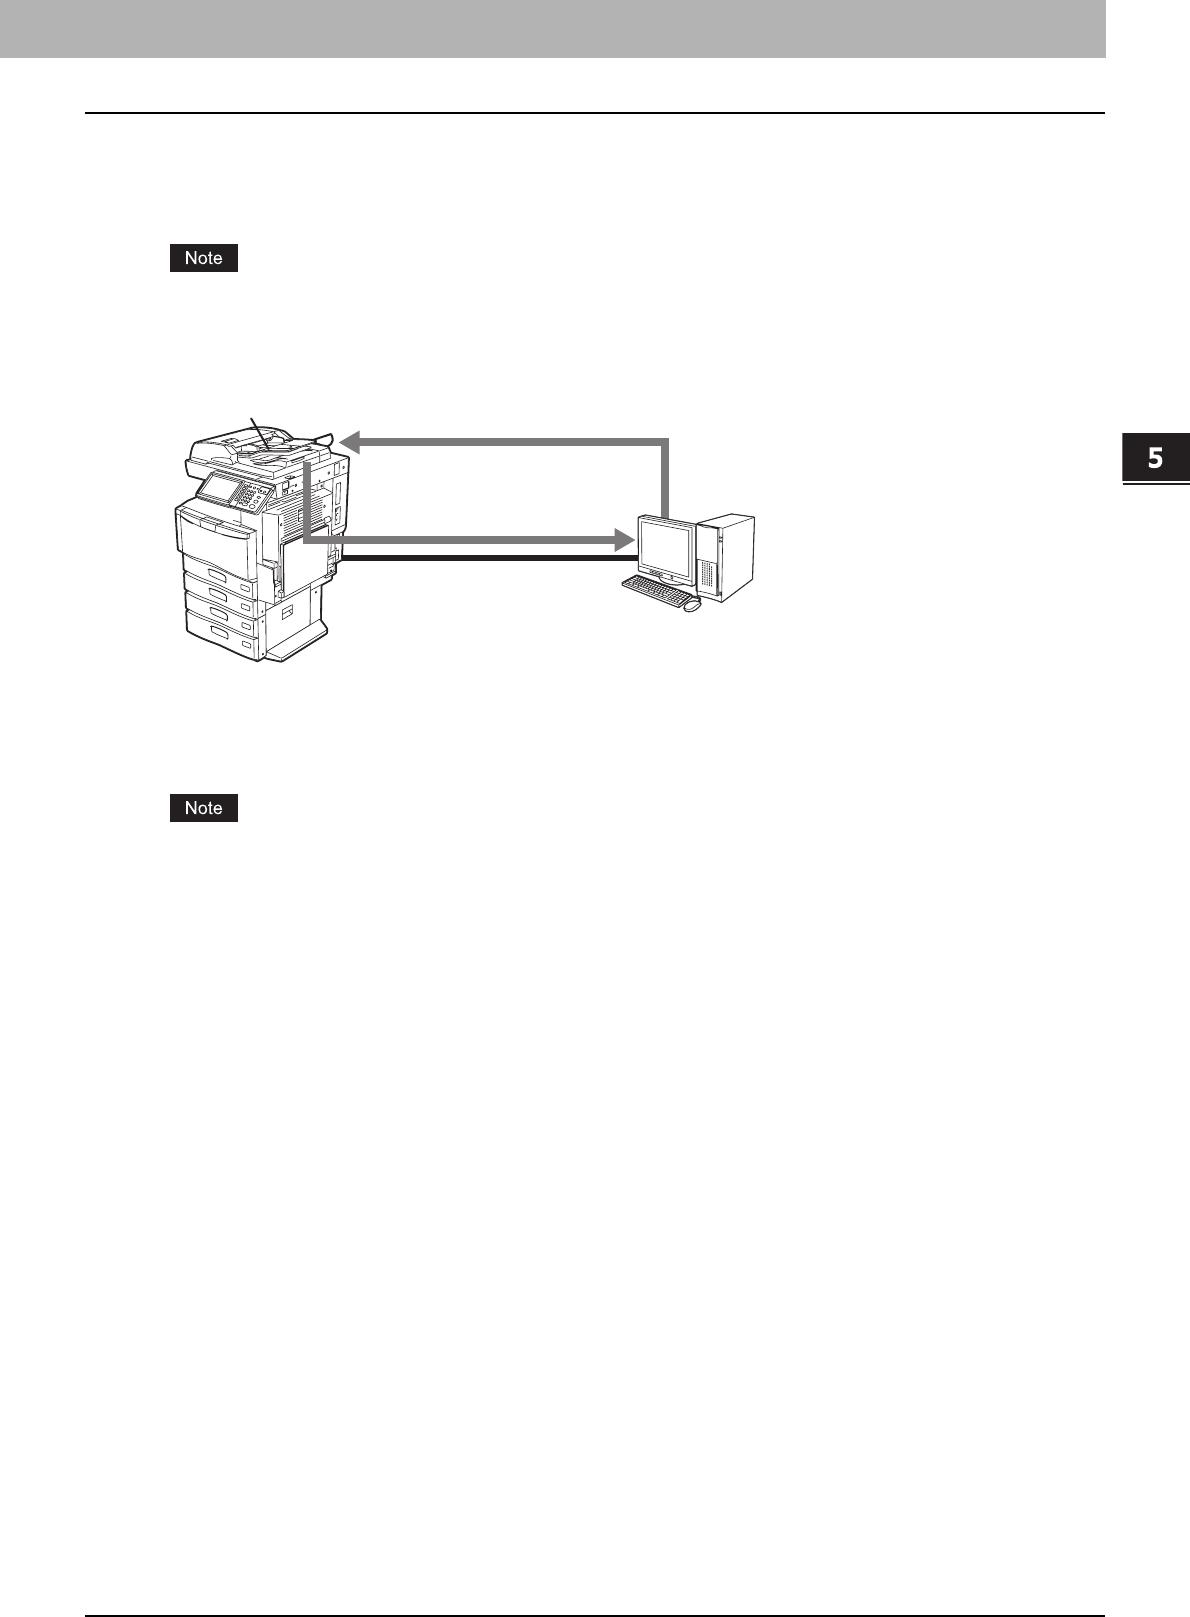 Toshiba 2040C, 206L, 2540C, 256, 256SE, 3040C, 306, 306SE